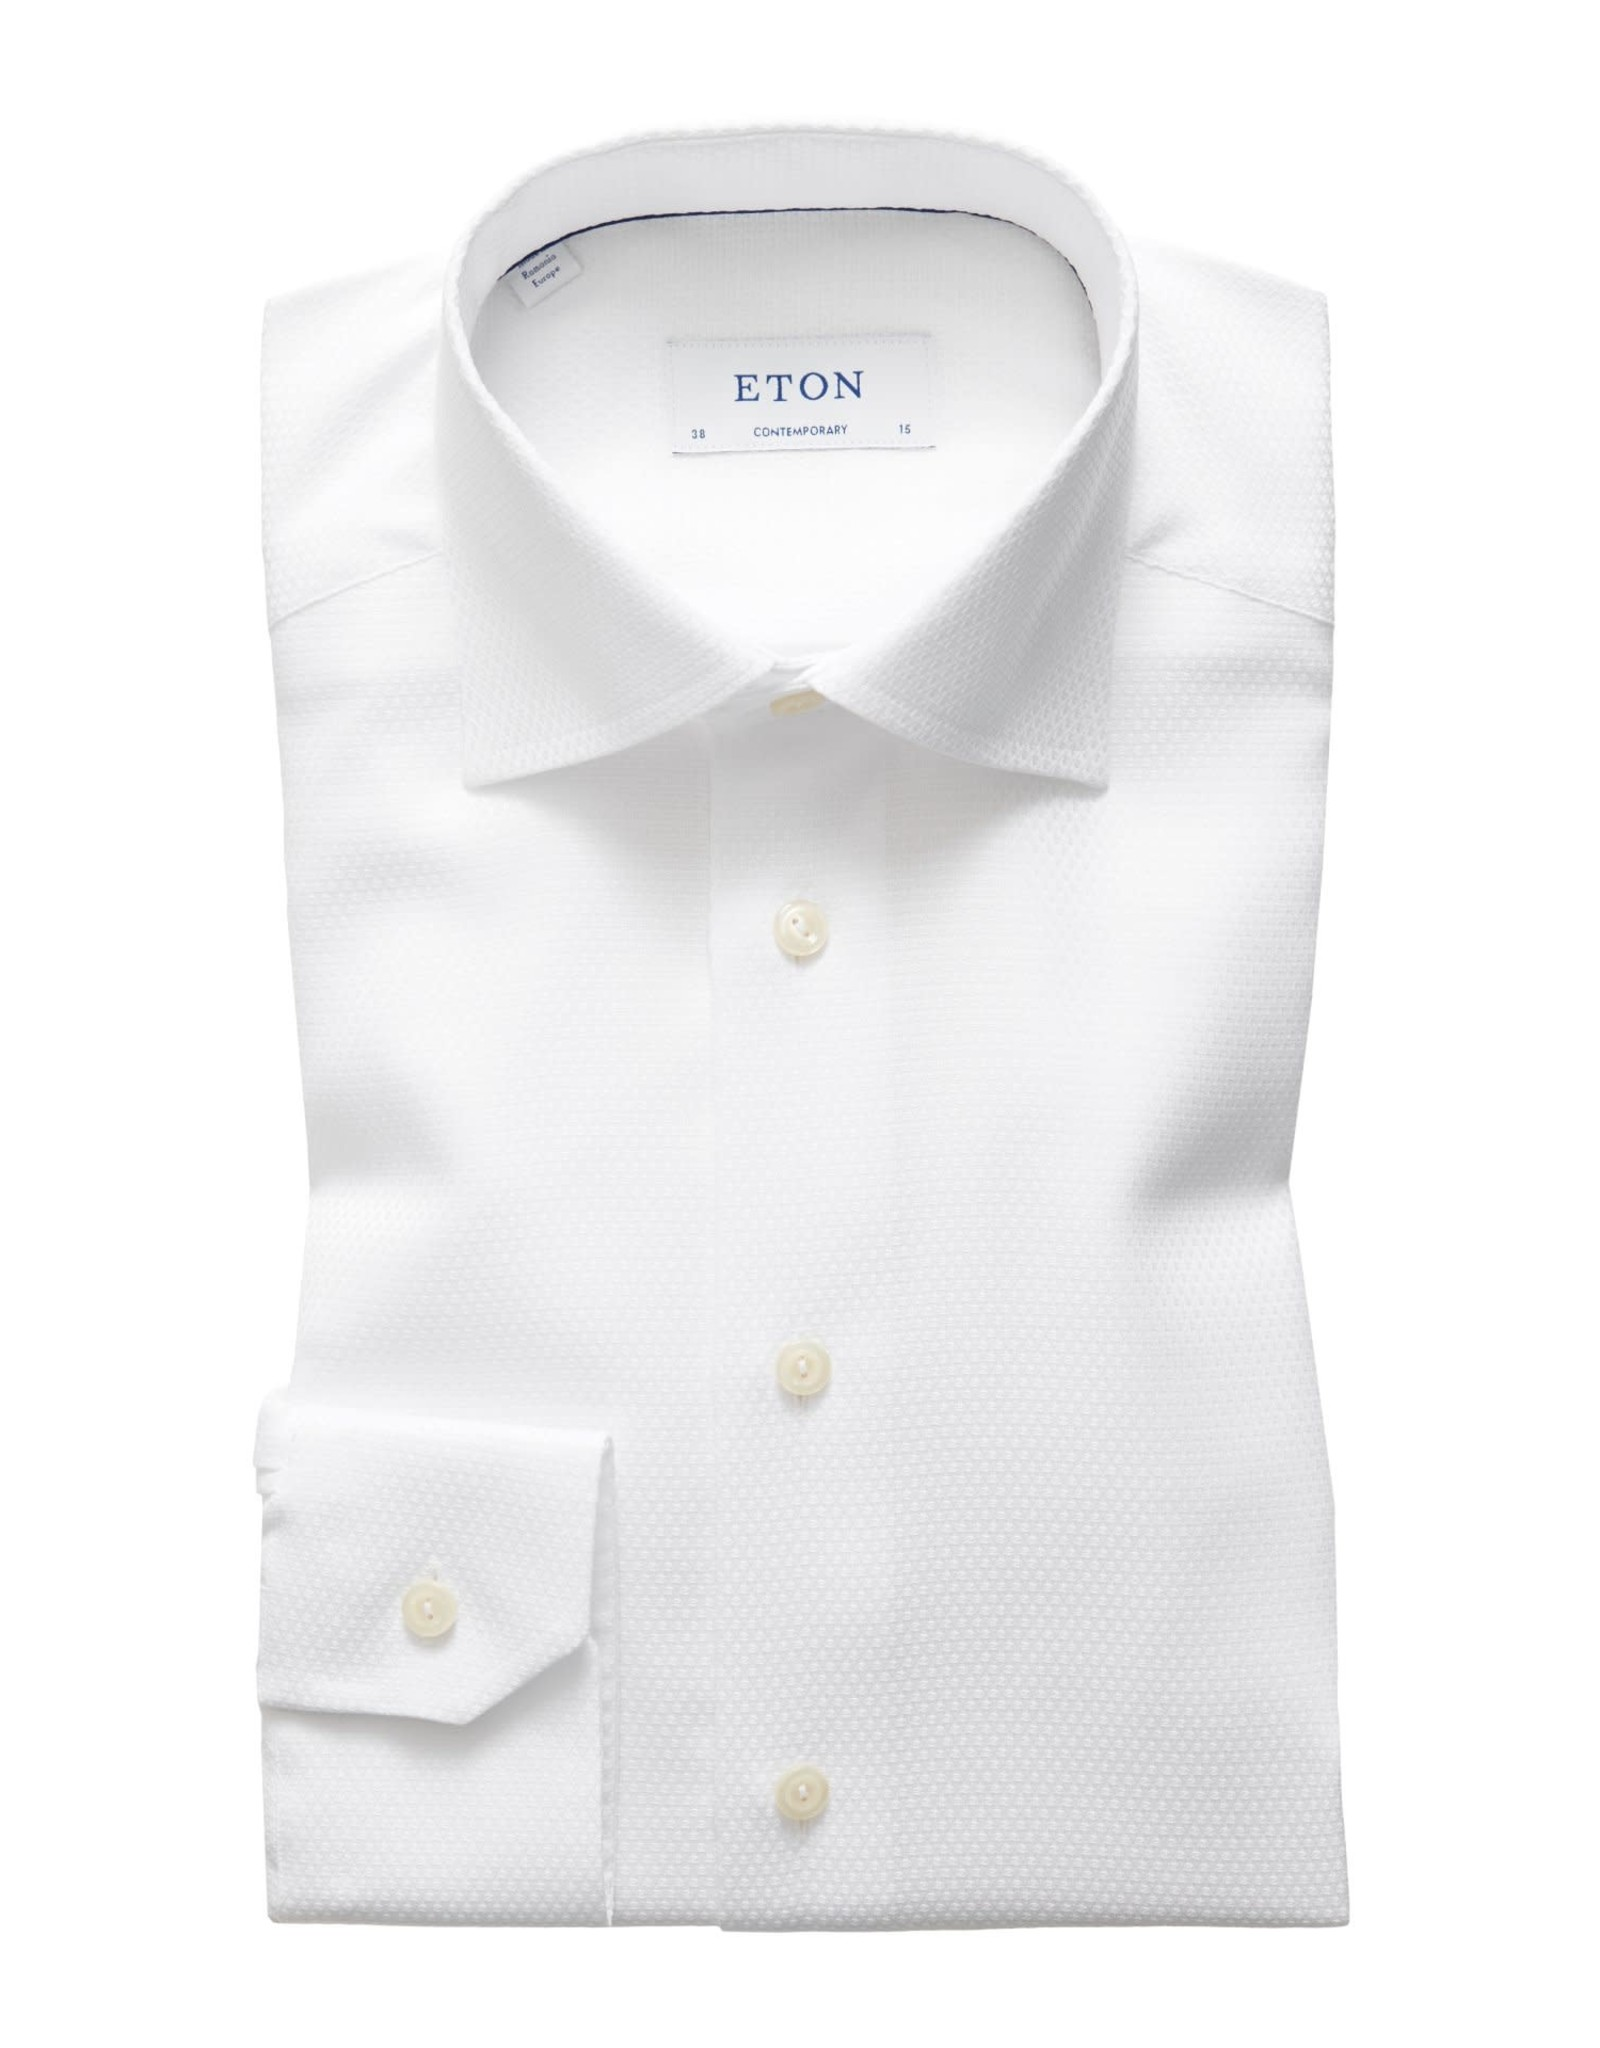 Eton Eton hemd wit contemporary FU 285